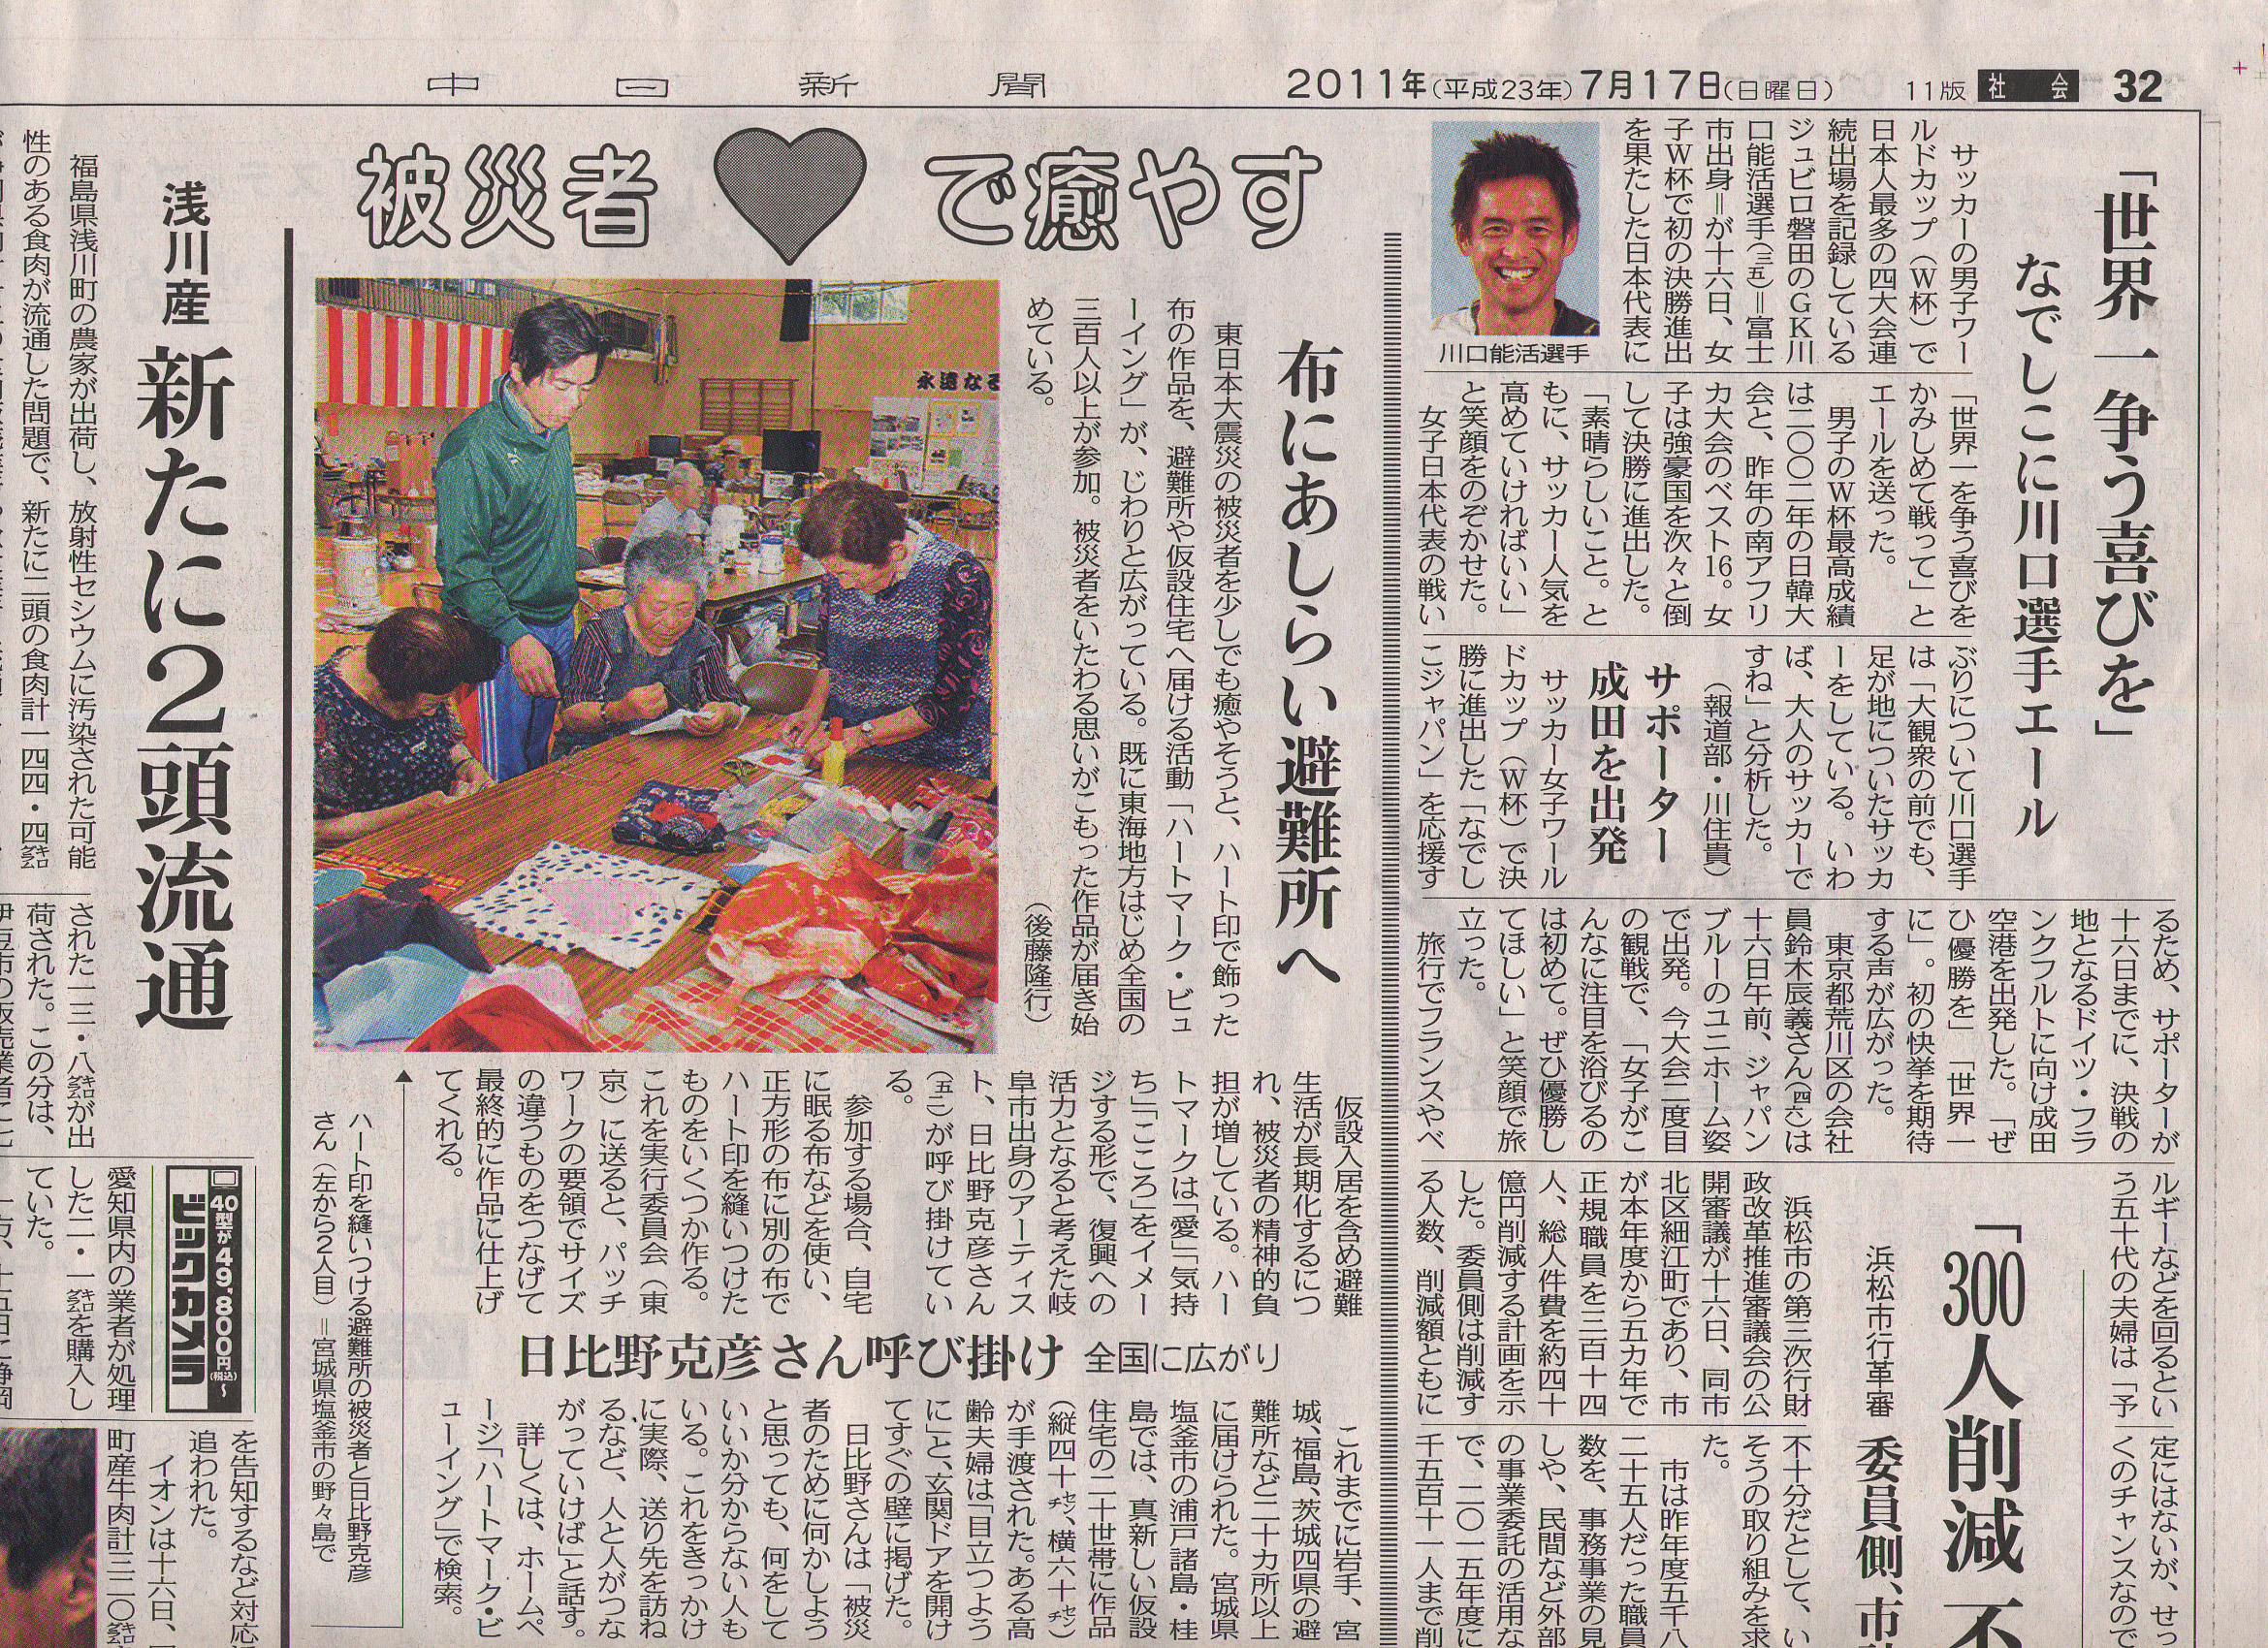 http://heartmarkviewing.jp/archive/img/2011.07.17_BCfF__7J9_B.jpg